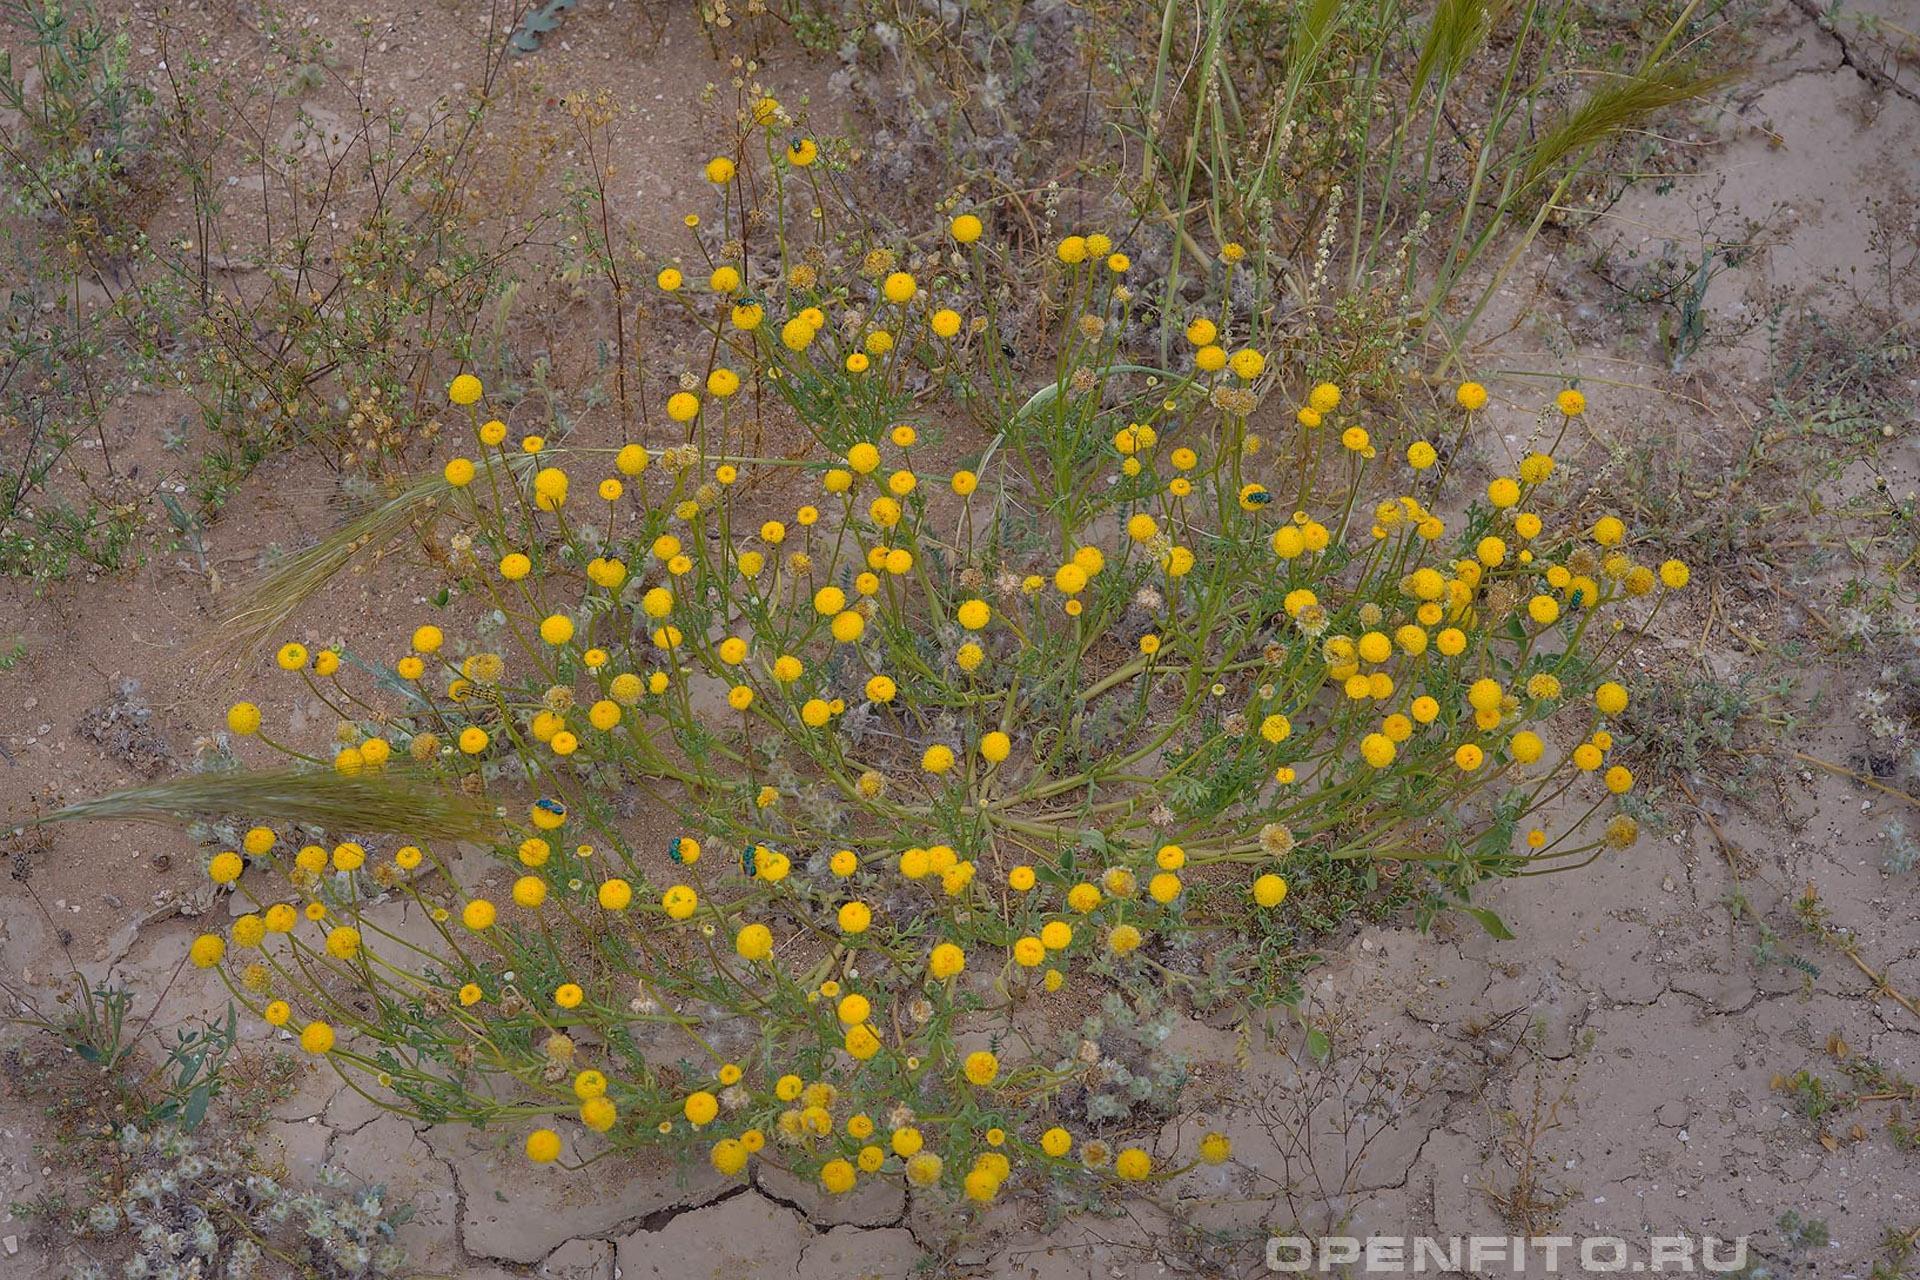 Ааронсония Факторовского взрослая цветущая трава